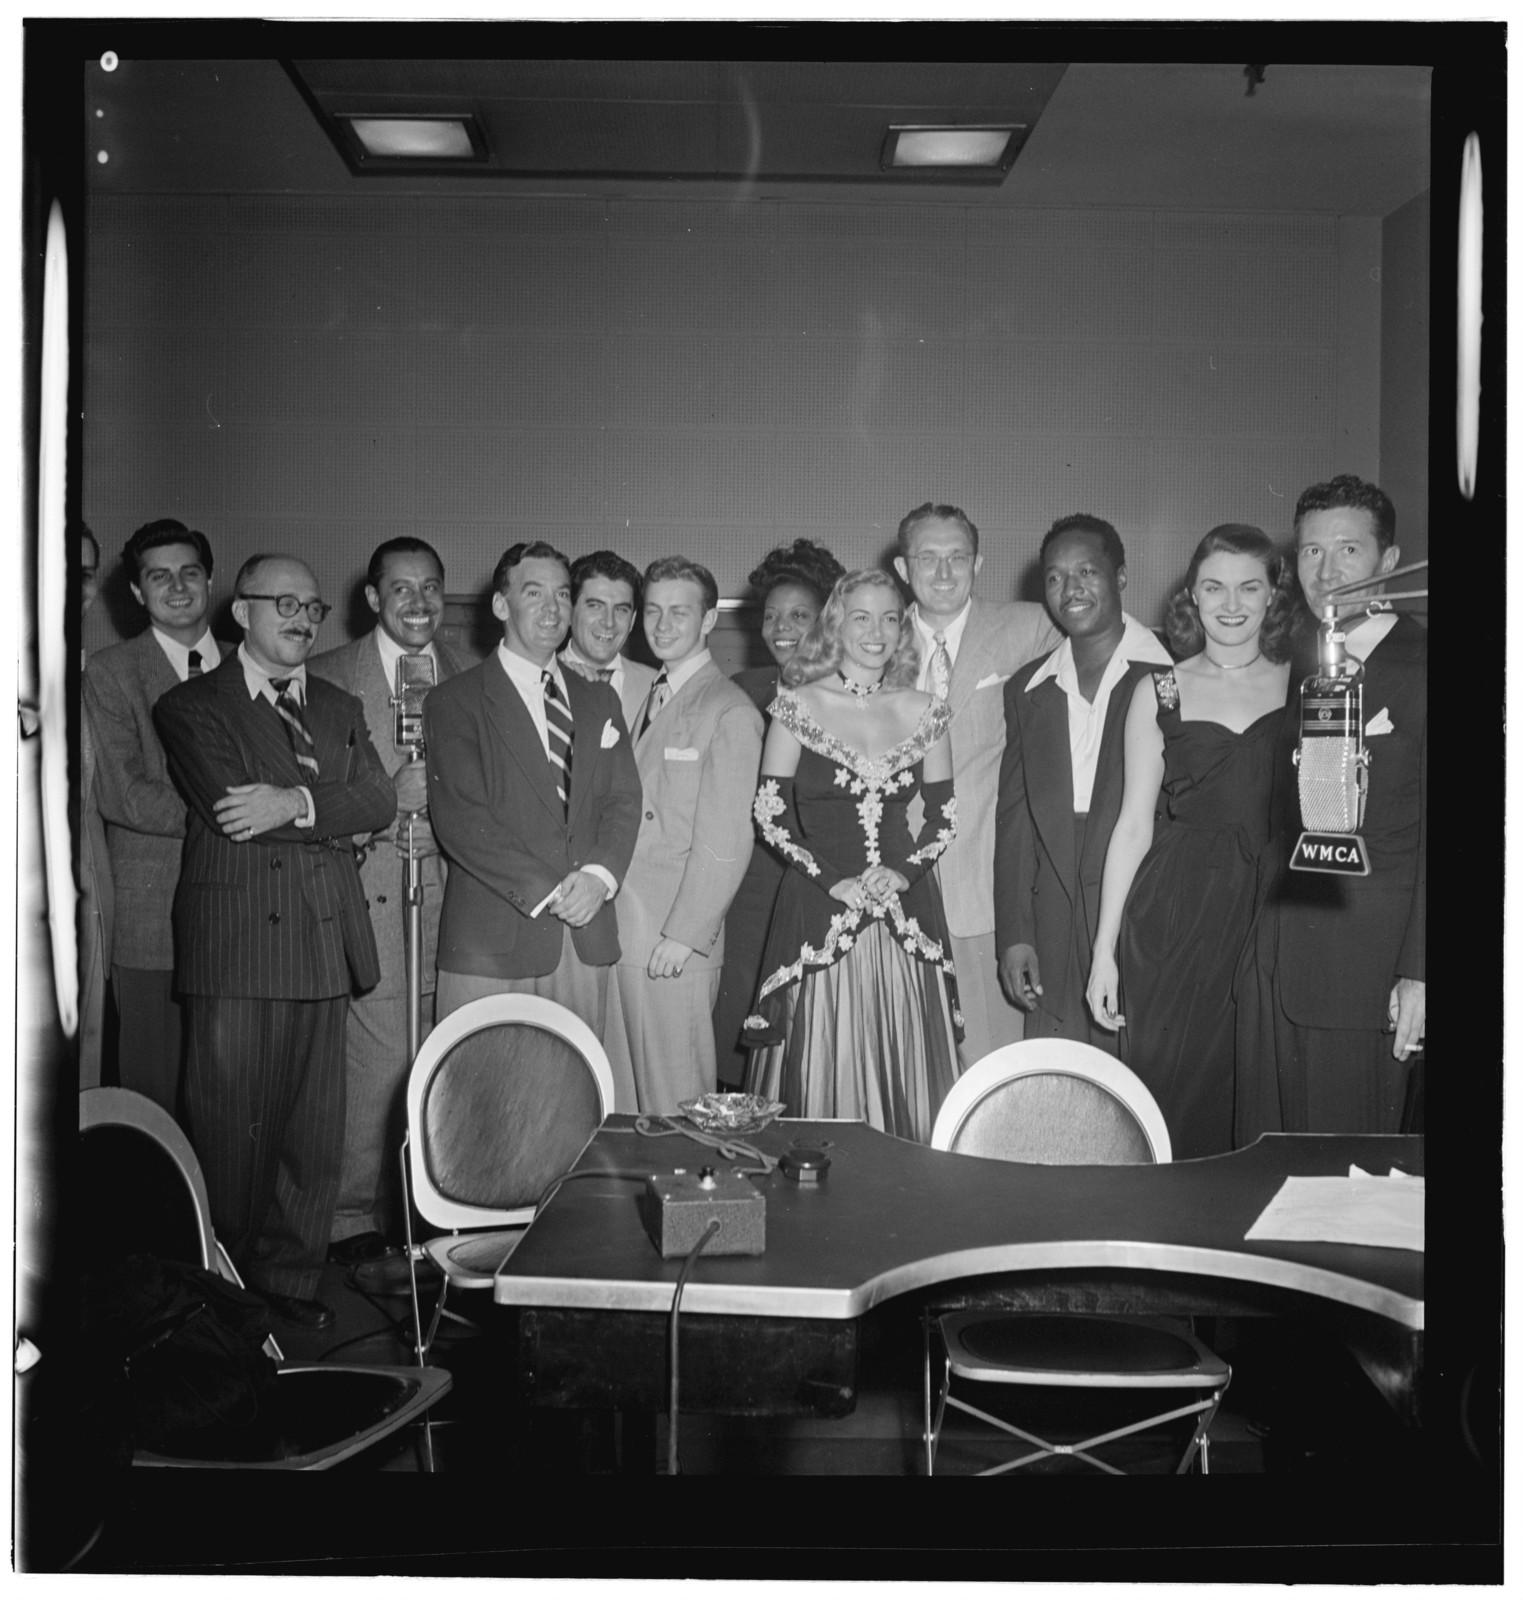 [Portrait of Johnny Desmond, Martin Block, Cab Calloway, Georgie Auld, Mel Tormé, Mary Lou Williams, Tommy Dorsey, Josh White, Beryl Davis, and Ray McKinley, WMCA, New York, N.Y., ca. Oct. 1947]